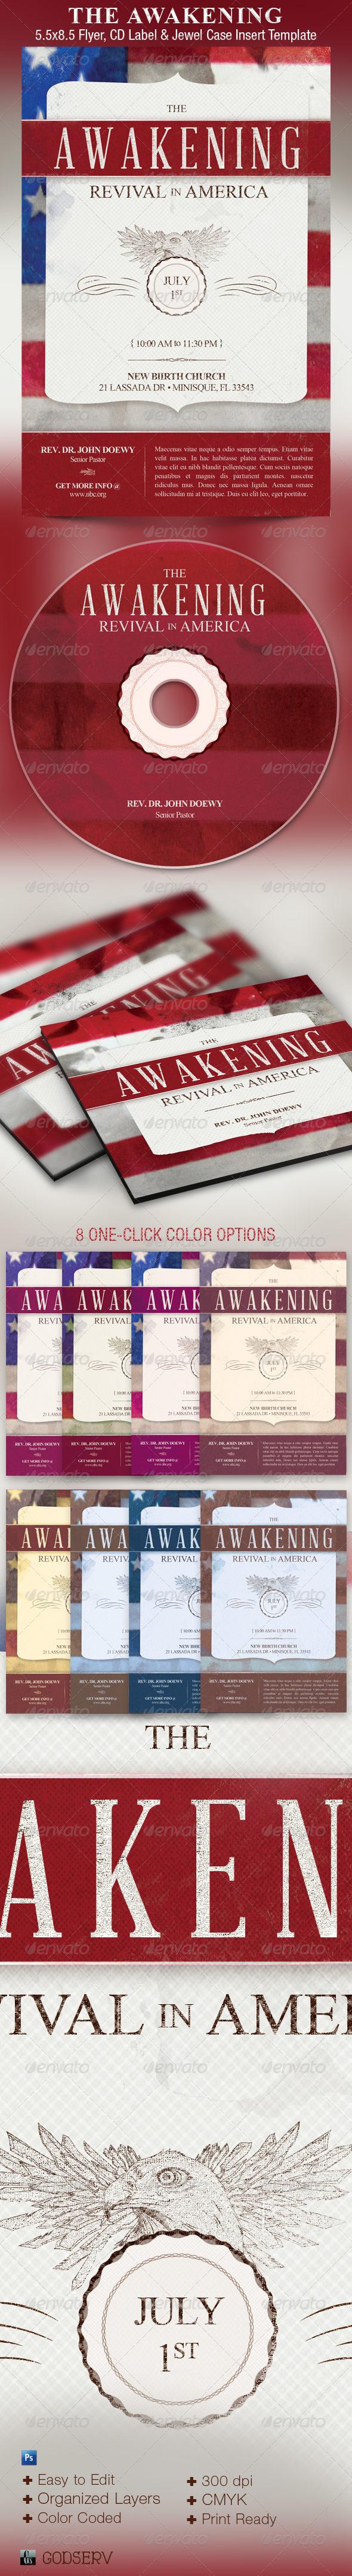 Awakening Revival Church Flyer CD Template - Church Flyers